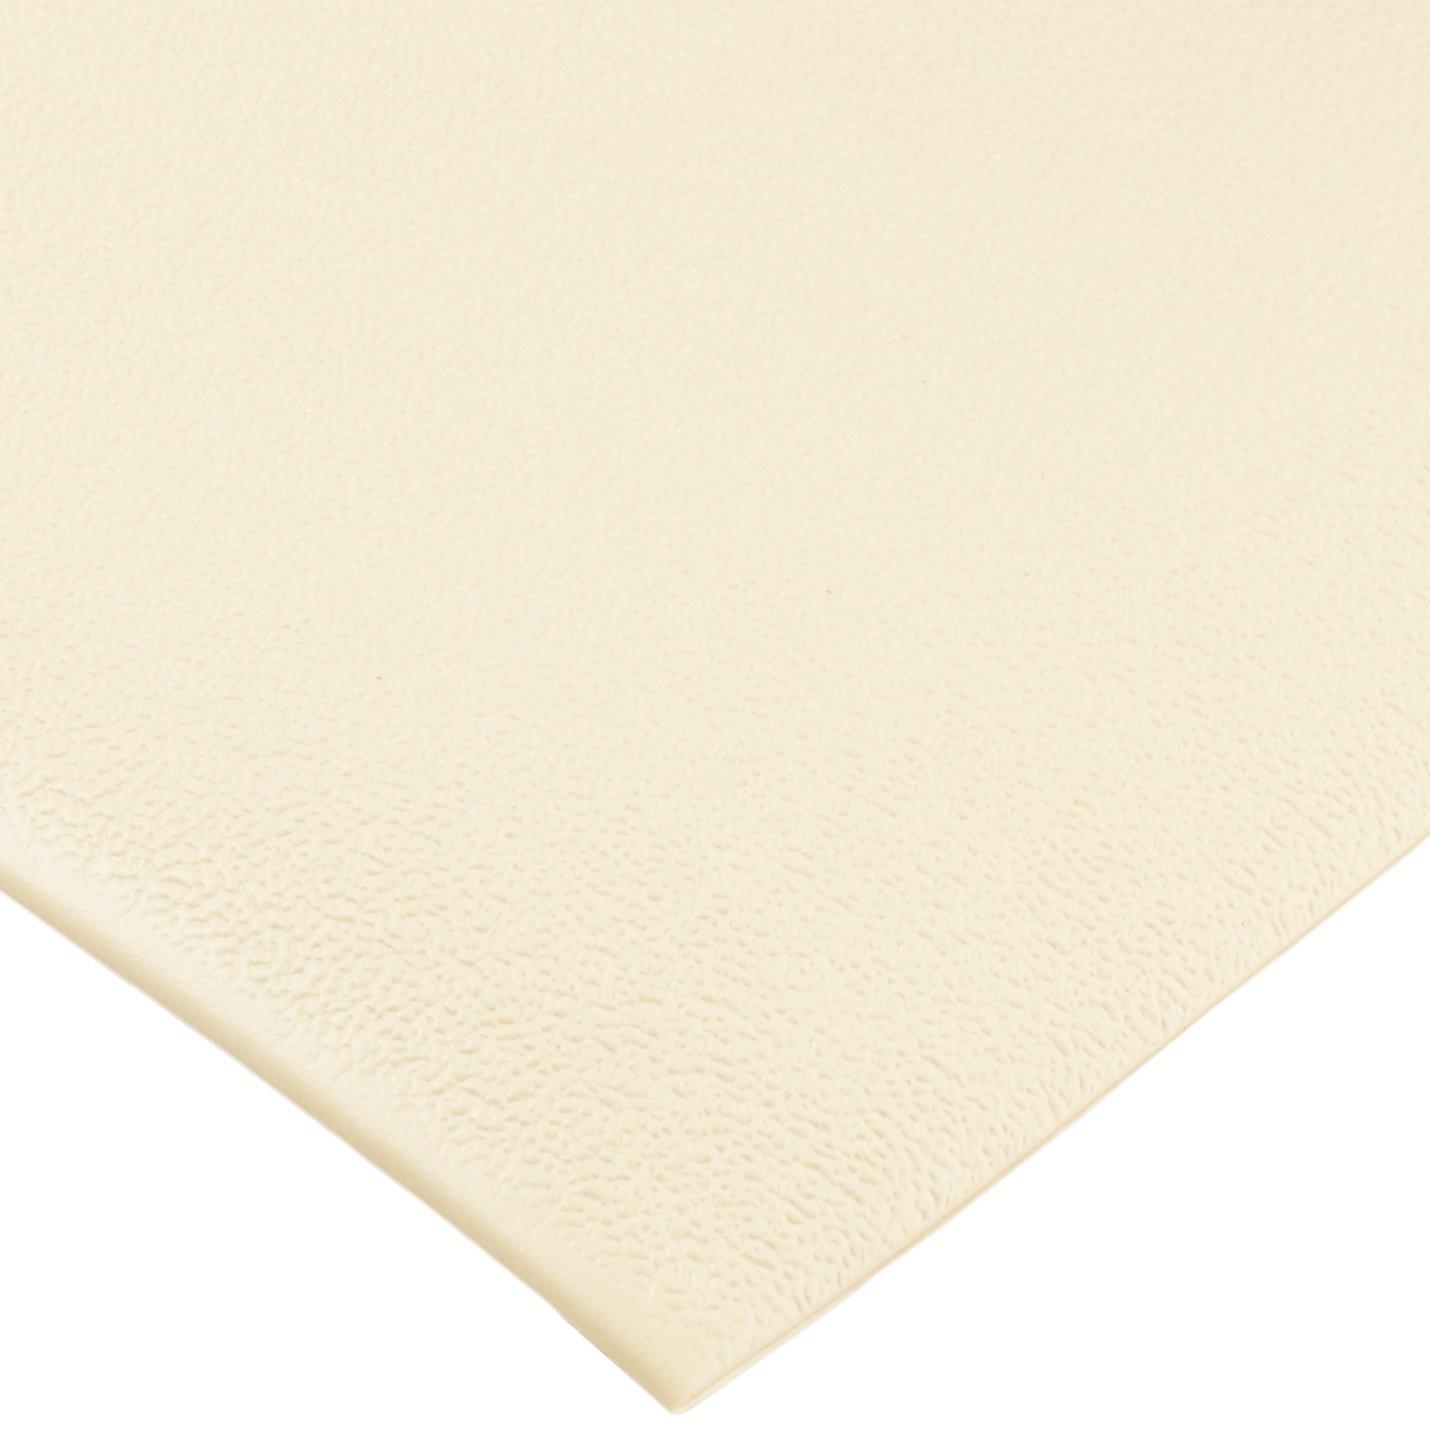 NoTrax C01S2030BL Kitchen Comfort Mat 20 Width x 30 Length x 3//8 Thickness Black 20 Width x 30 Length x 3//8 Thickness